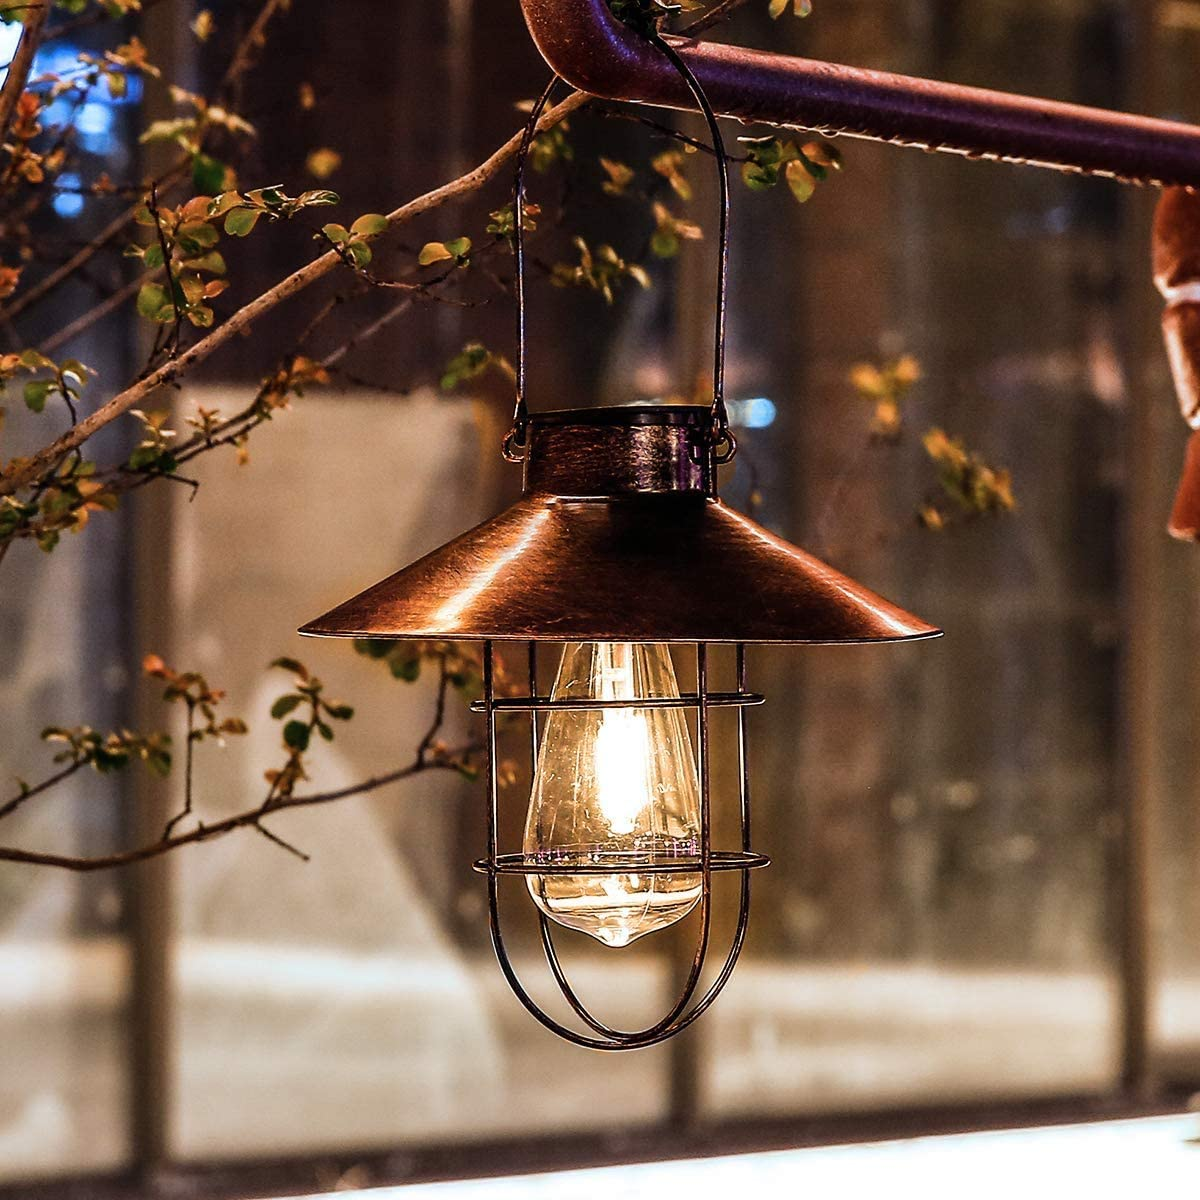 Solar Lantern Outdoor Hanging, Waterproof Vintage Metal Solar Garden Lantern Lights with Tungsten Bulb Decorative for Patio, Backyard, Courtyard, Landscape (Bronze)